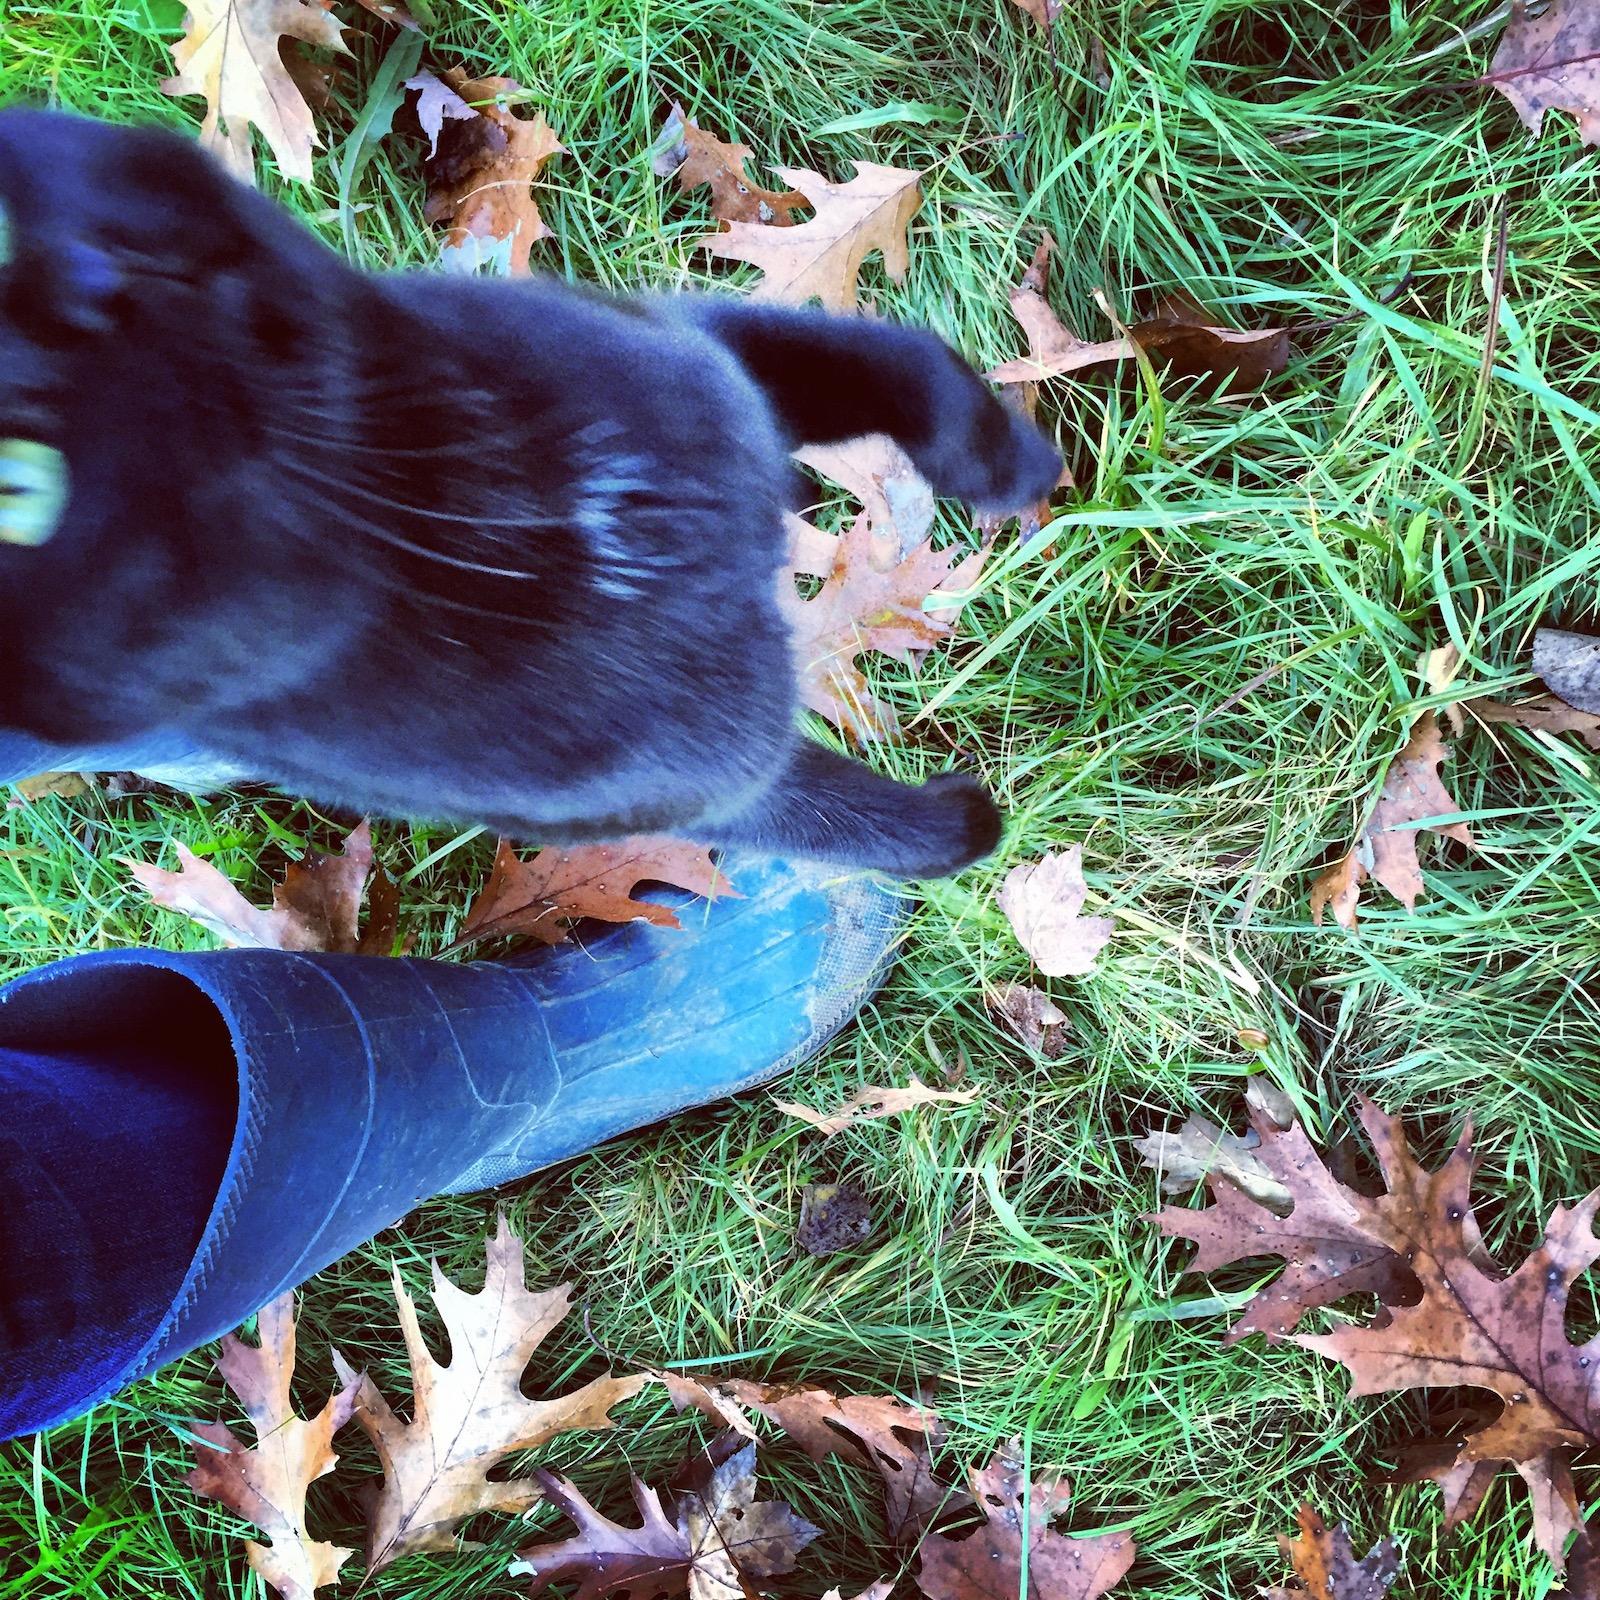 Black kitty says hello